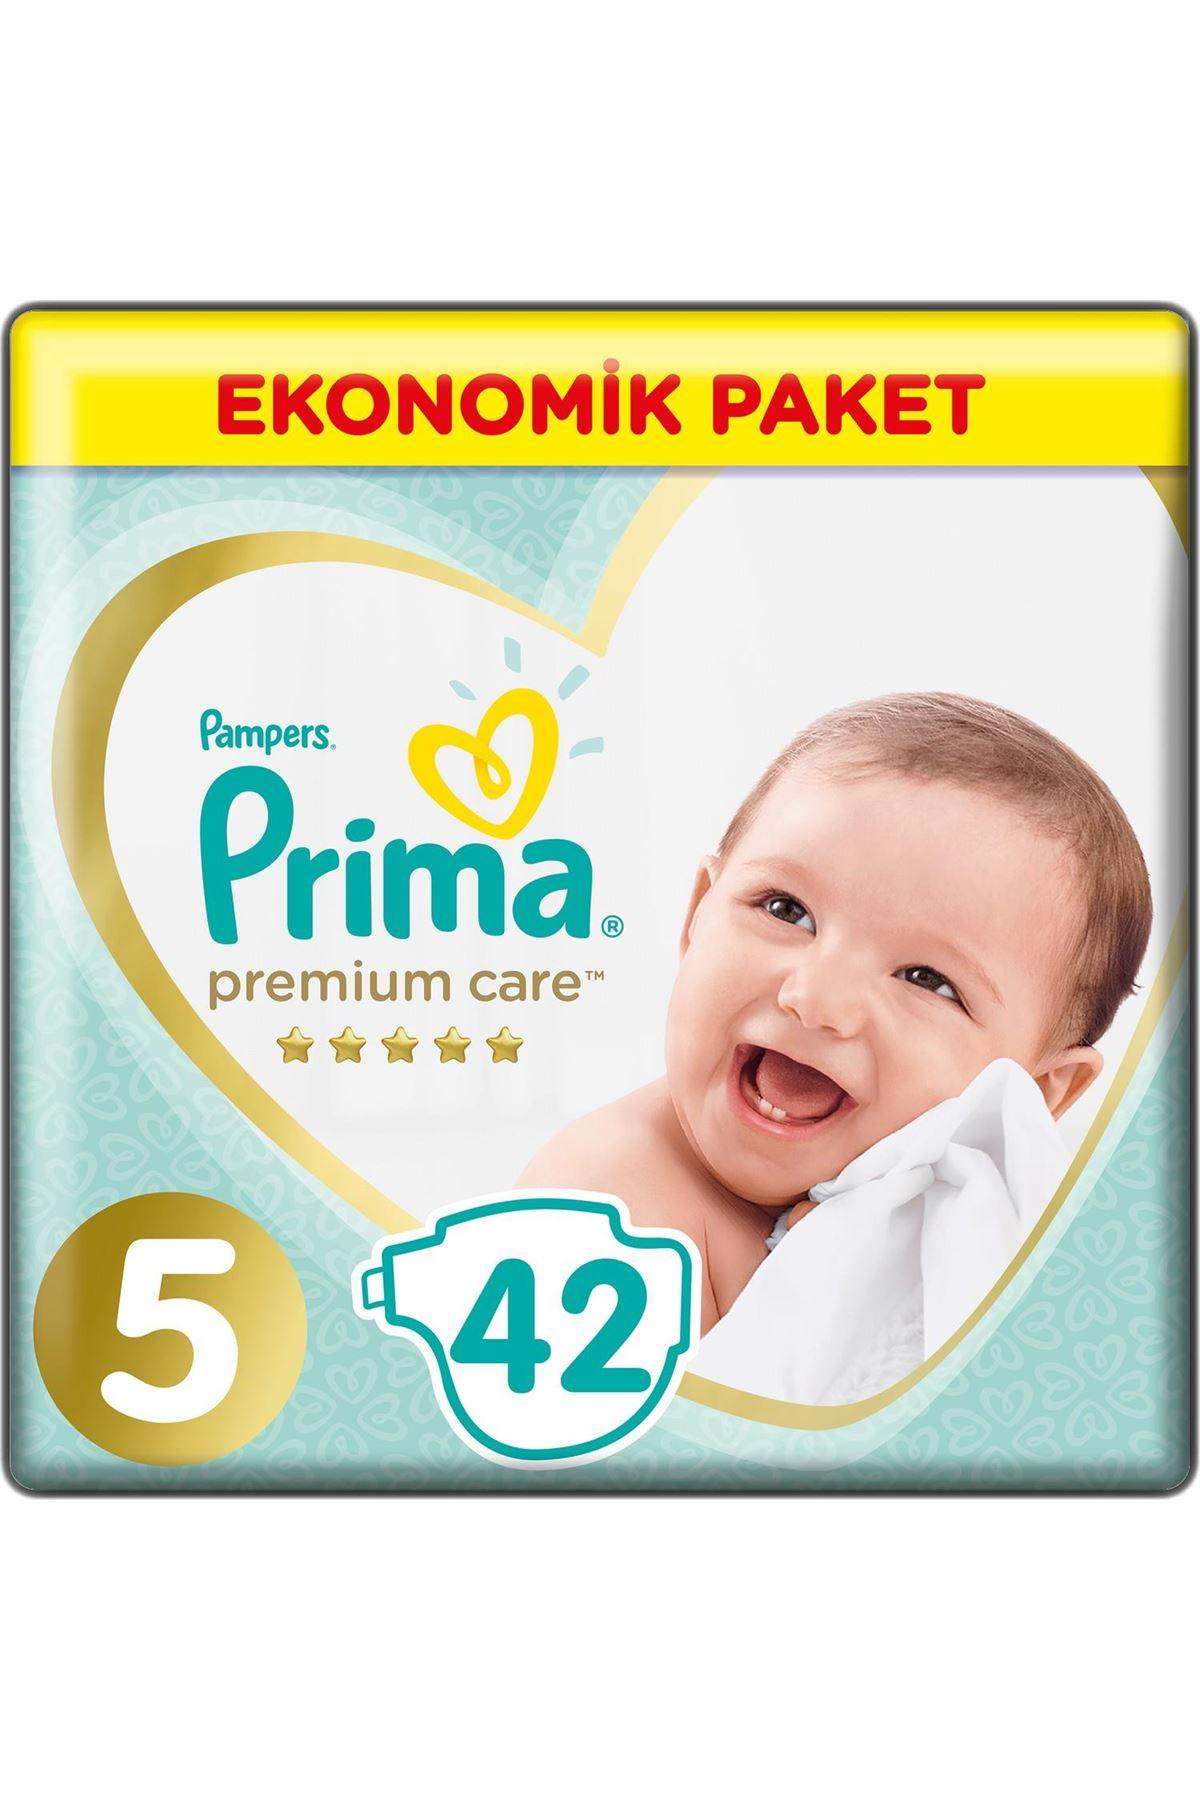 Prima Premium Care Bebek Bezi Ekonomik Paket 5 Beden 42 Adet